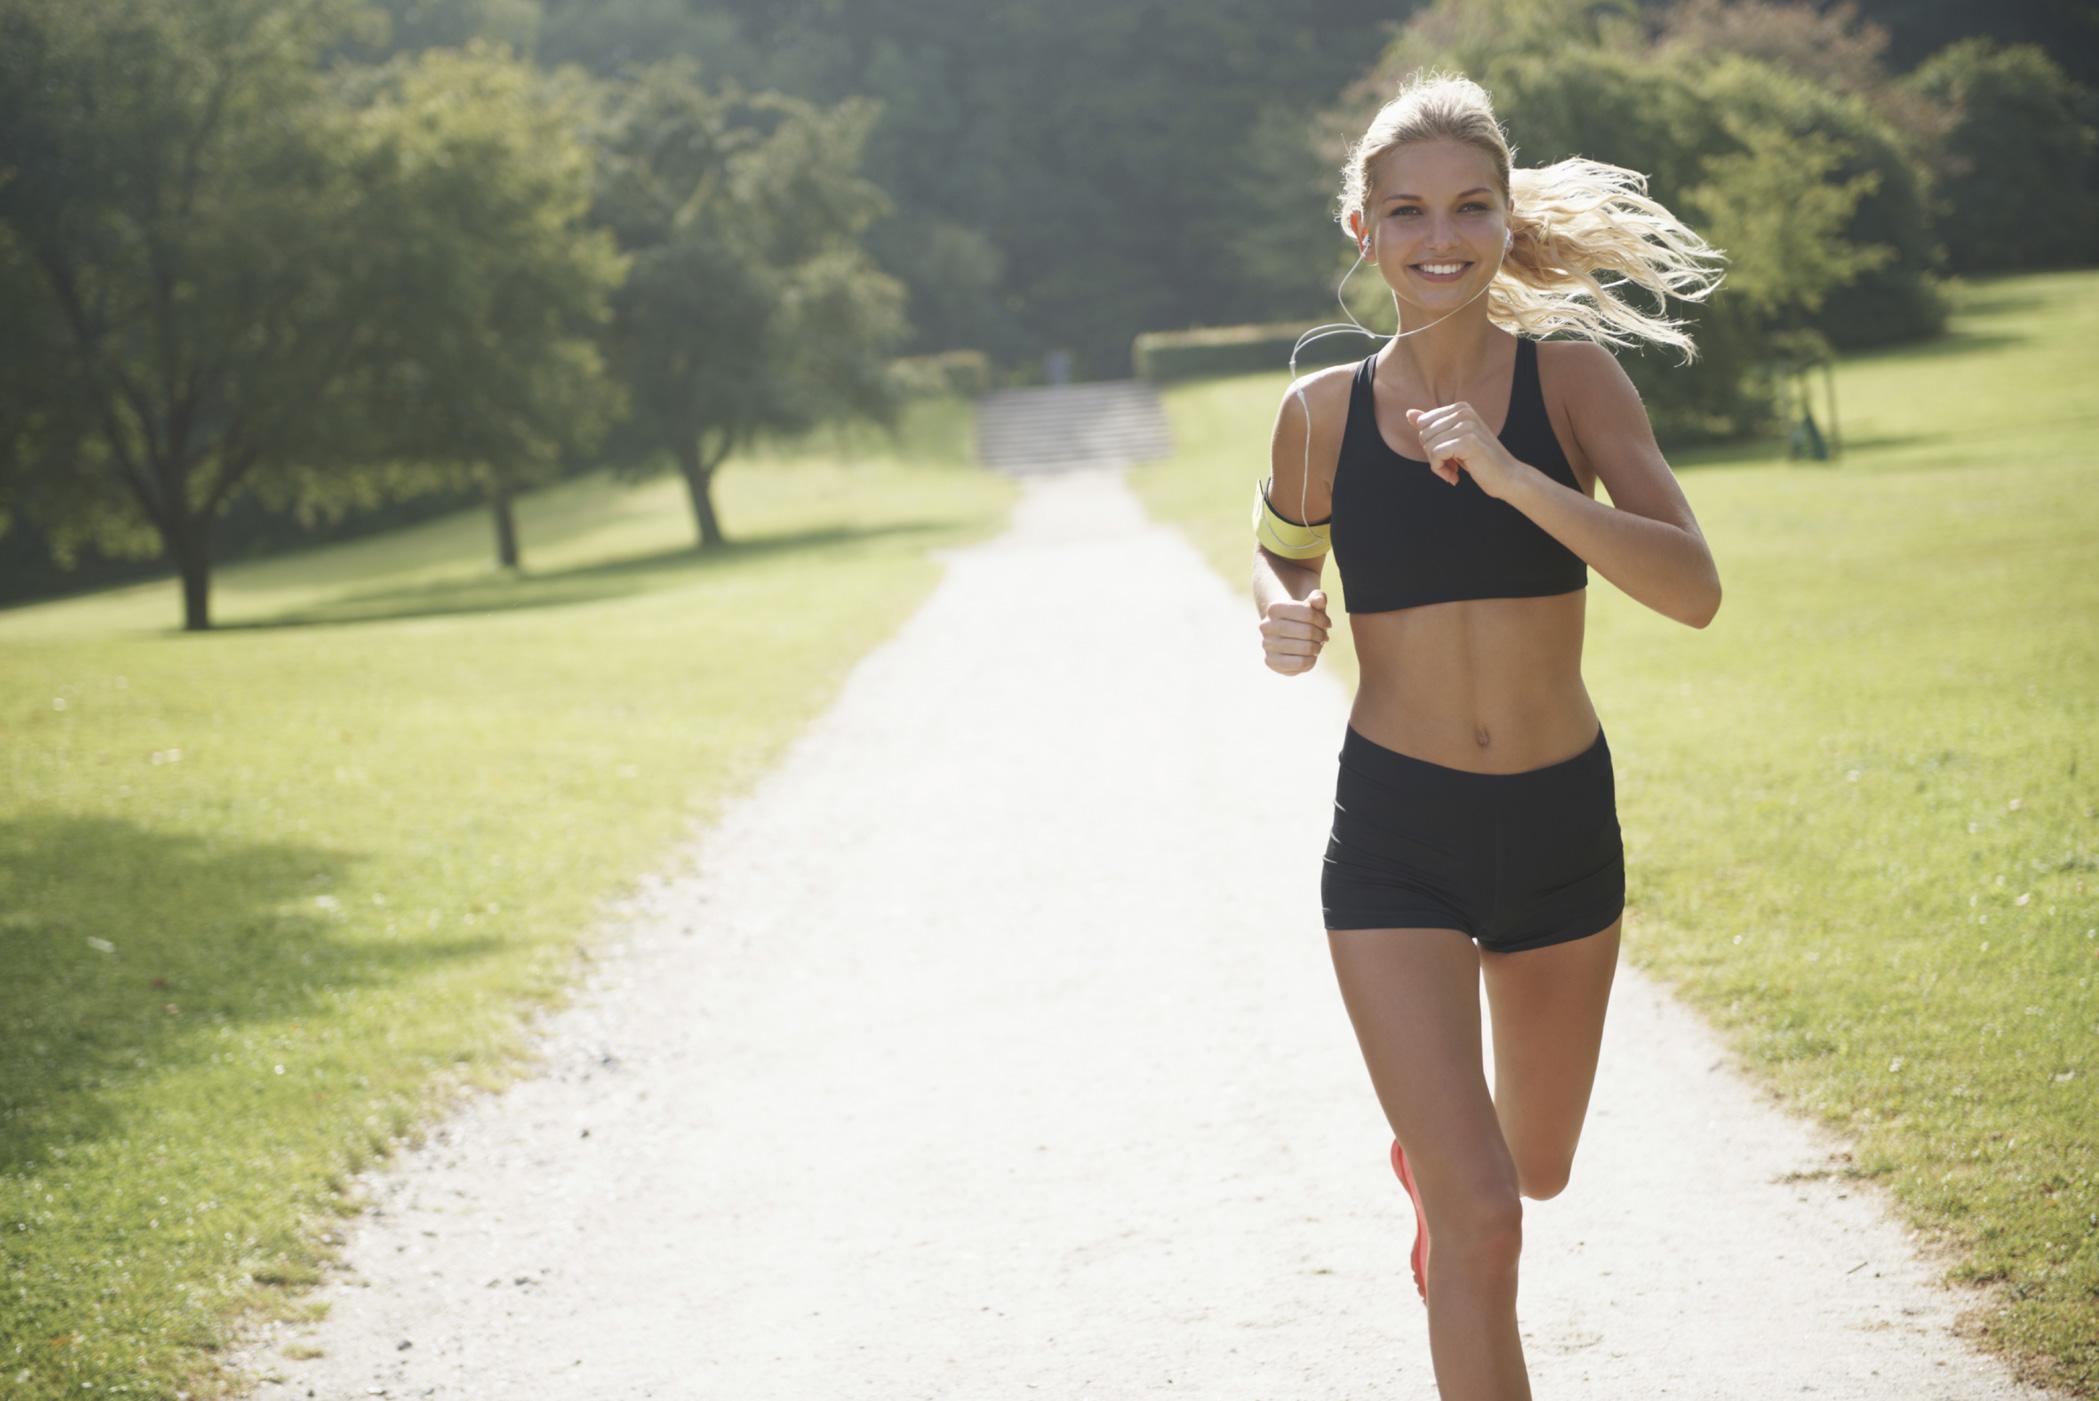 femina-22-femme-jogging_0